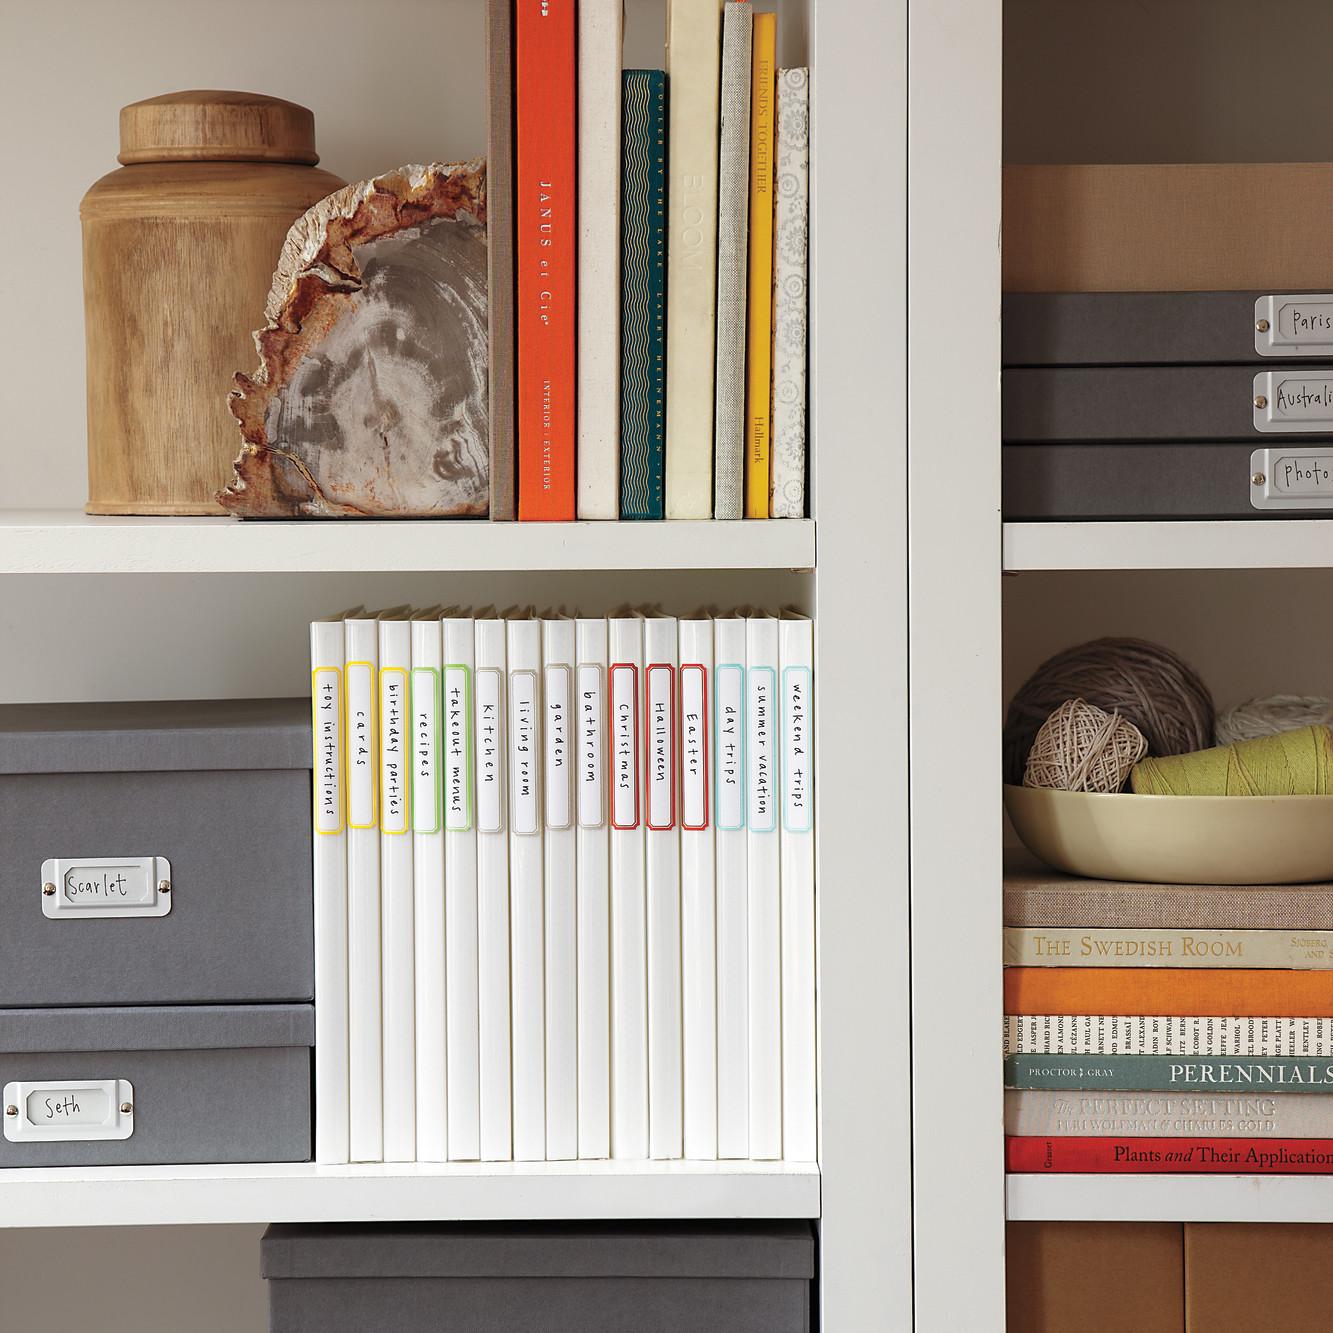 Dorable Martha Stewart Home Office Binder Images - Home Decorating ...